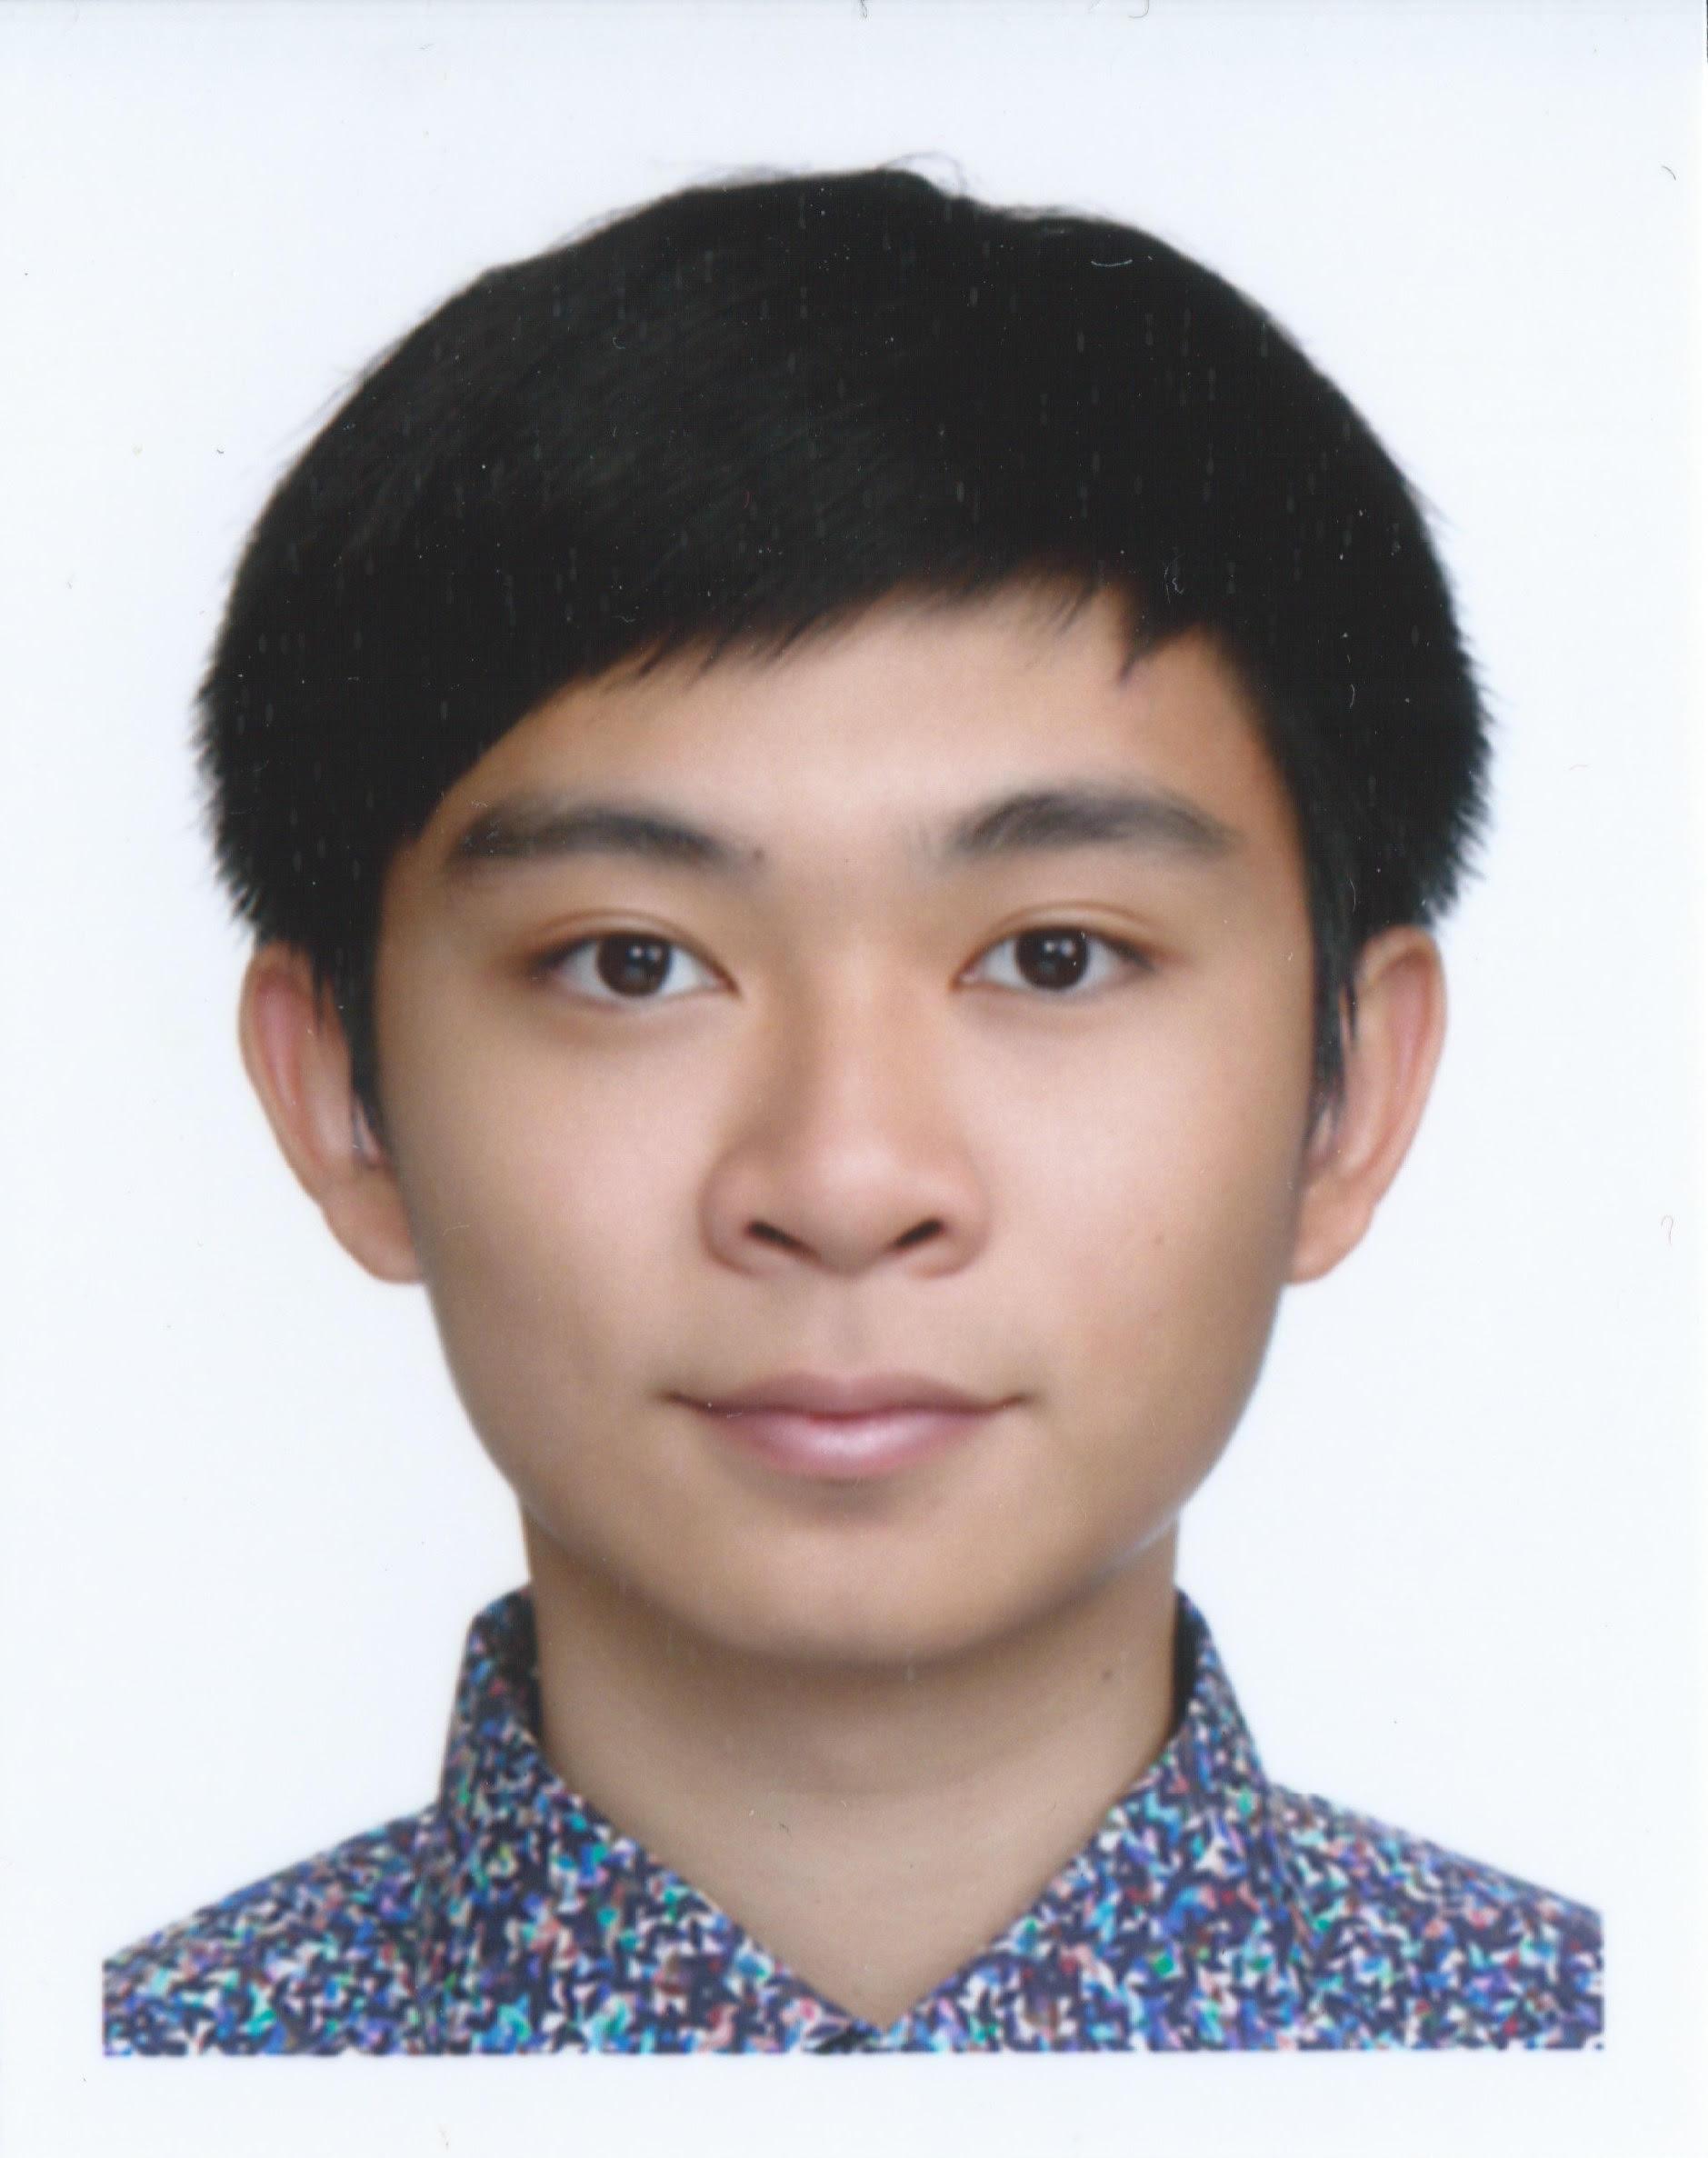 Arvin Wu